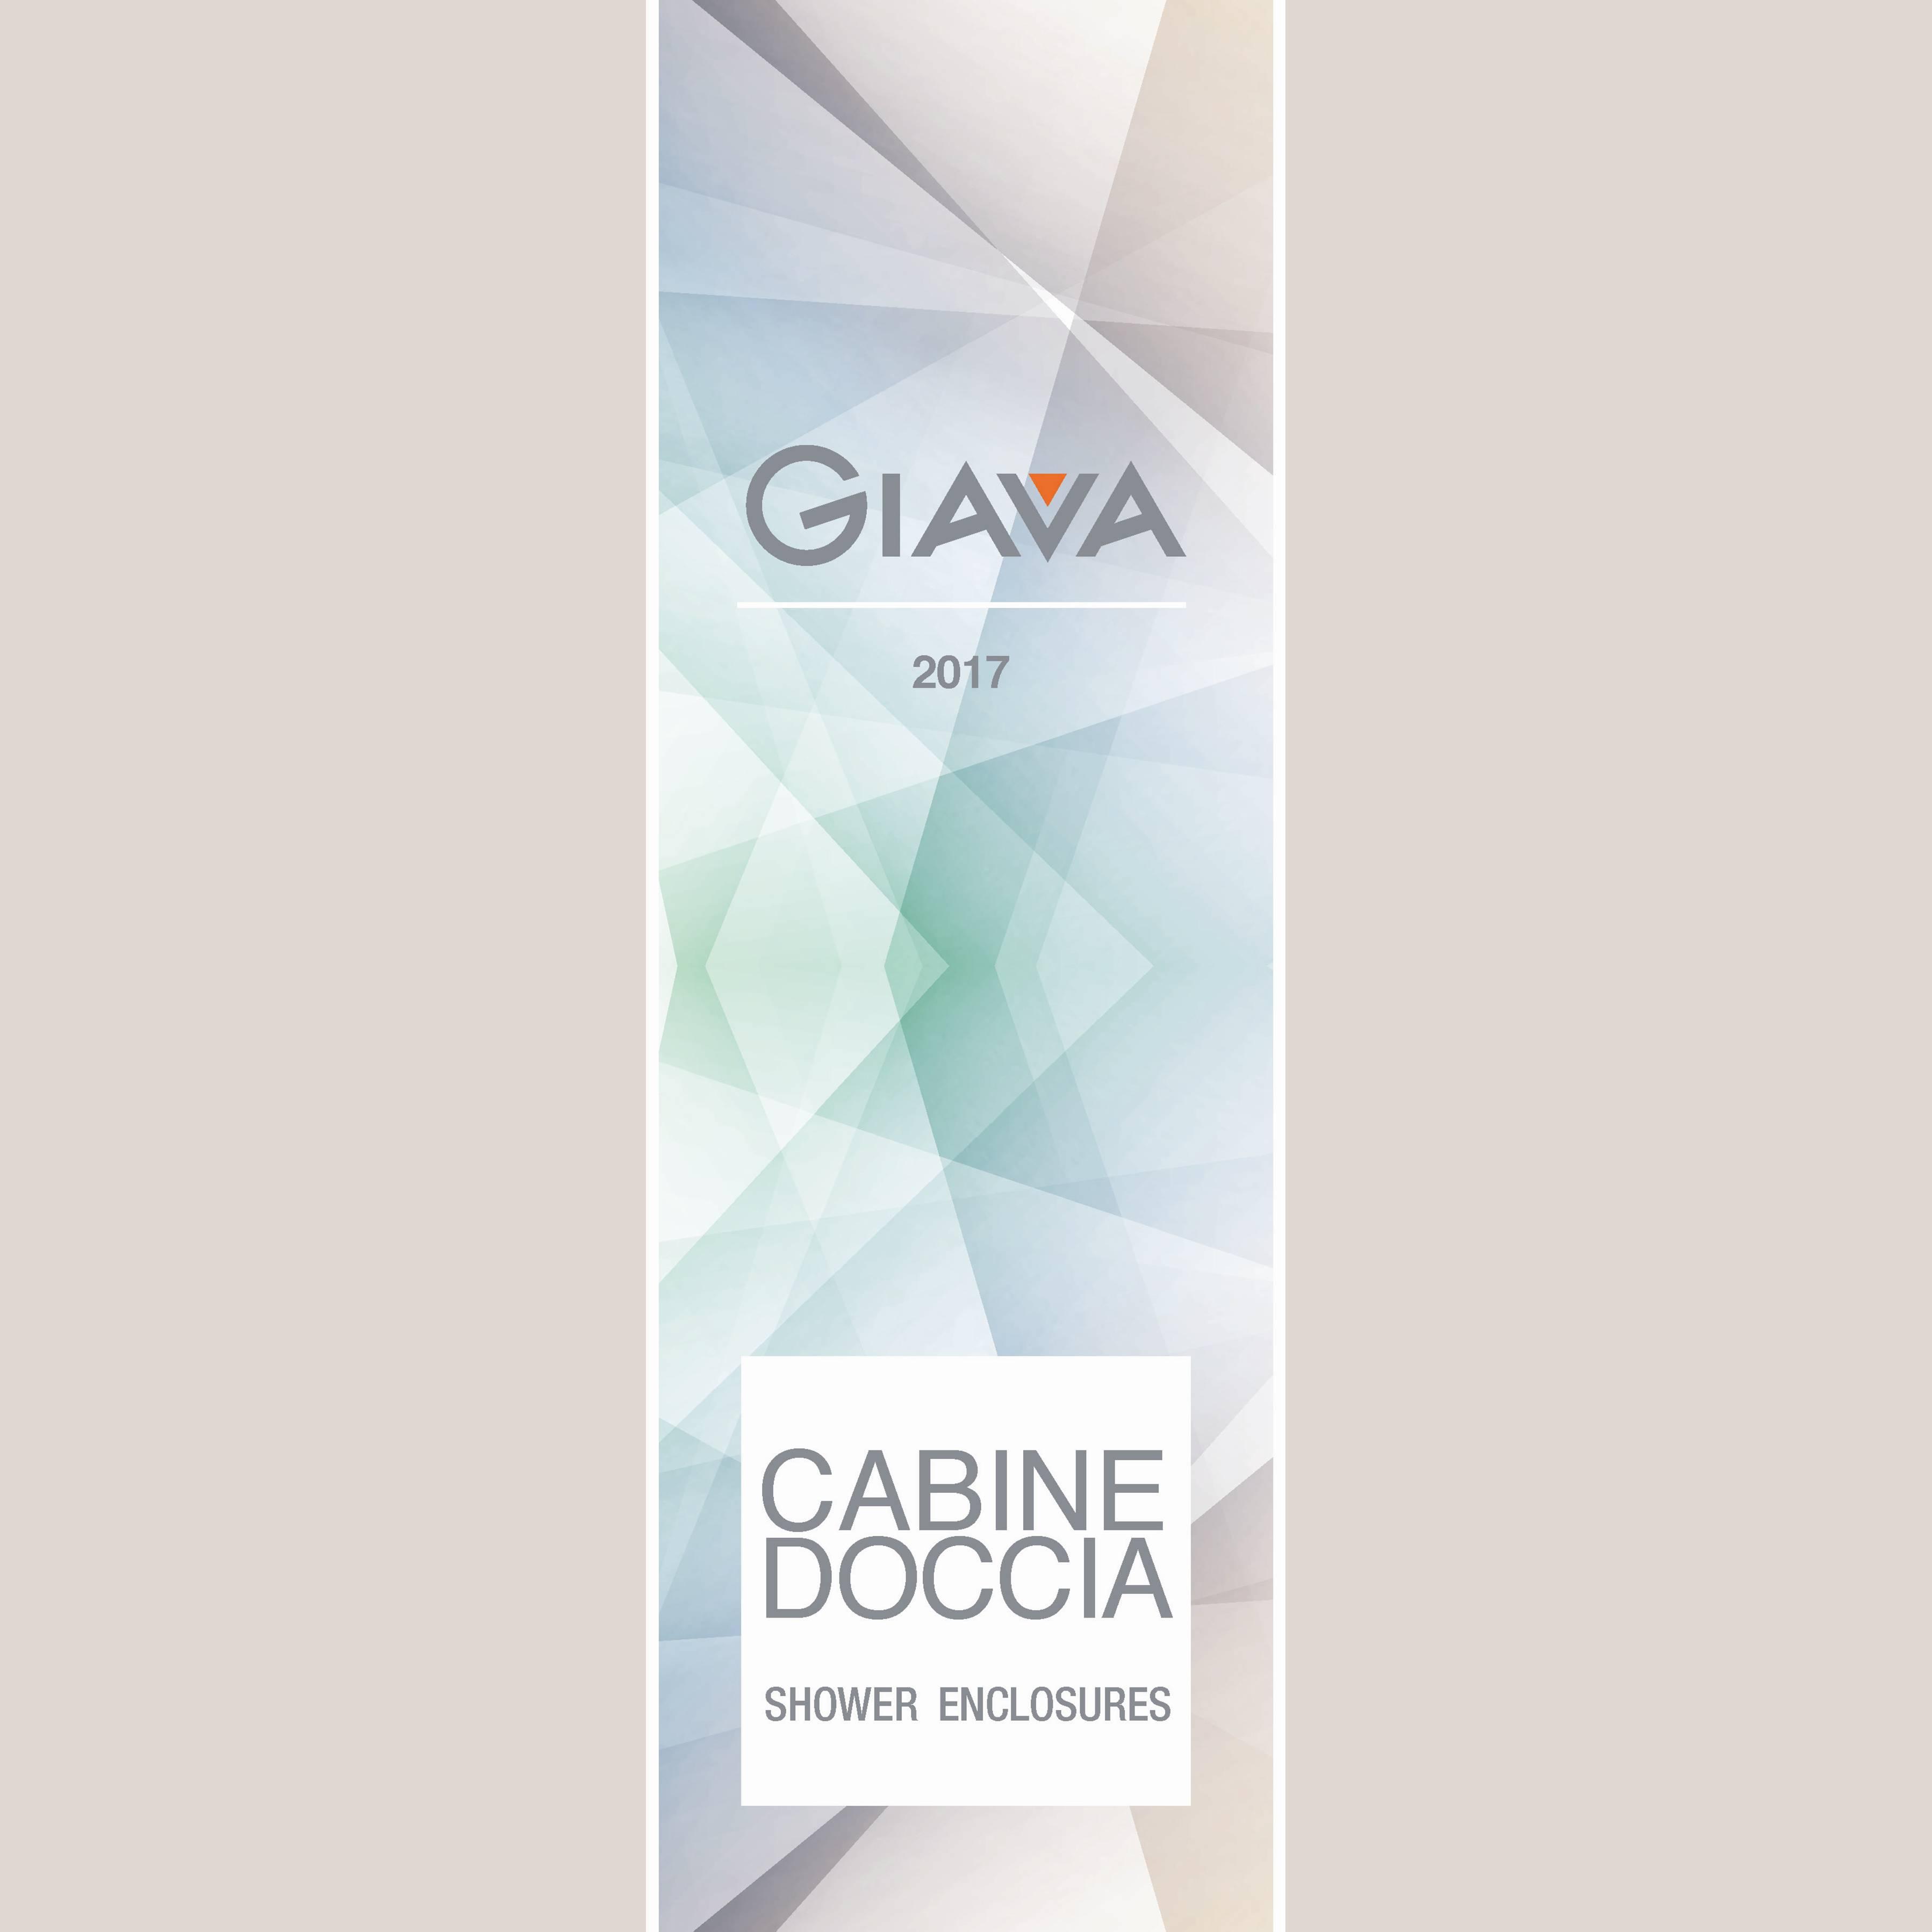 Giava Box Doccia Prezzi.Giava Catalogo Cabine Doccia 2017